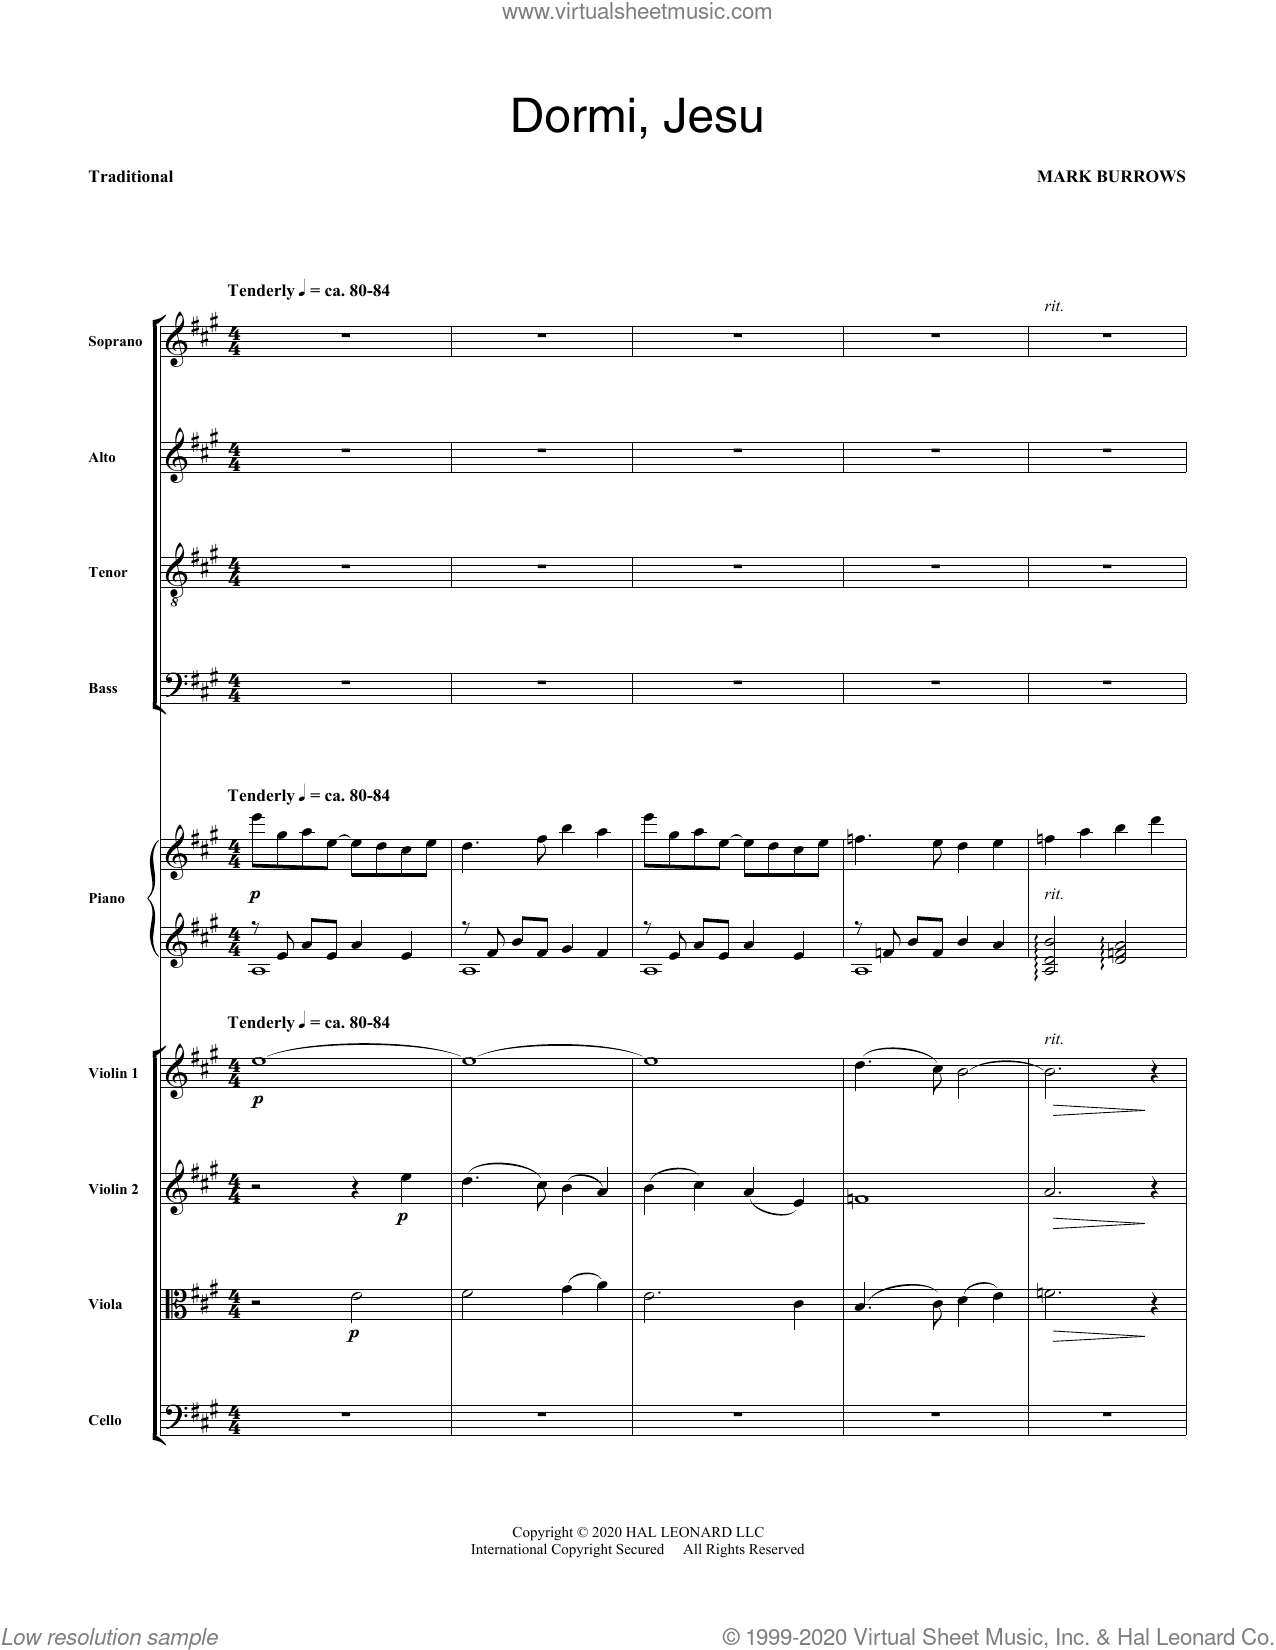 Dormi, Jesu (COMPLETE) sheet music for orchestra/band by Mark Burrows, intermediate skill level